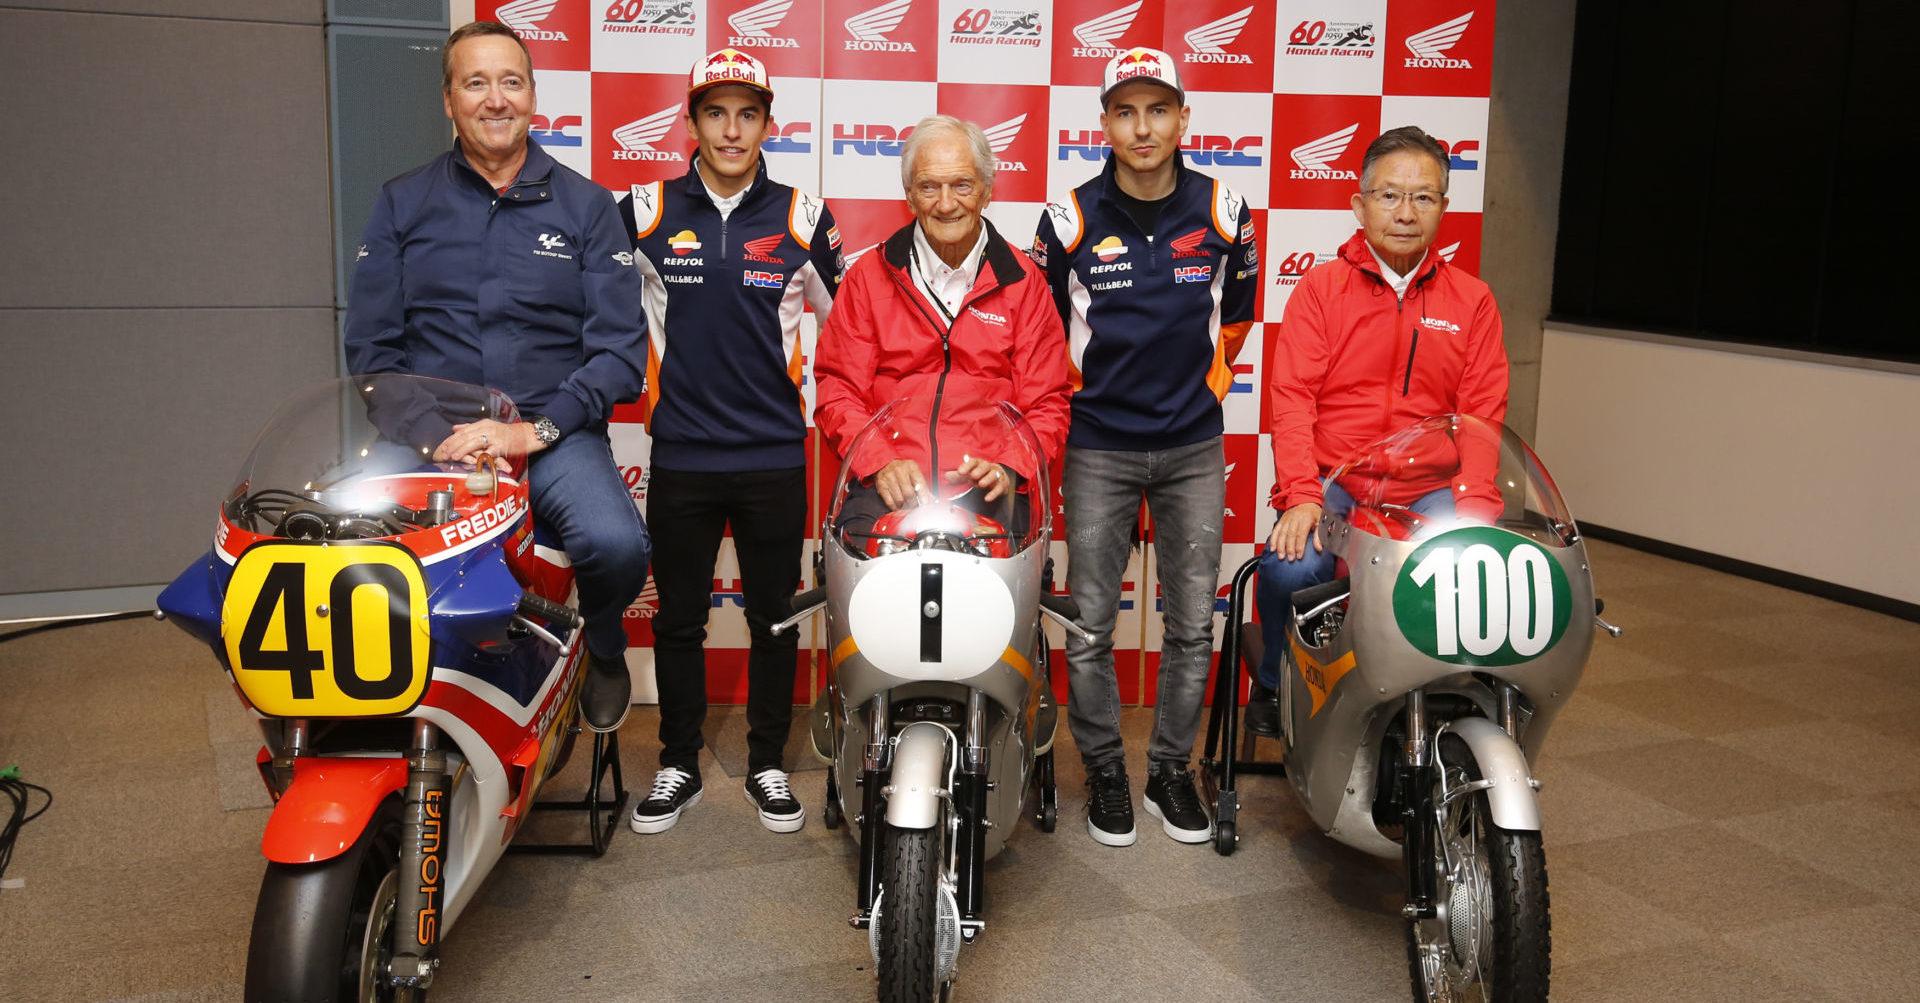 (From left) Freddie Spencer, Marc Marquez, Jim Redman, Jorge Lorenzo, and Kunimitsu Takahashi. Photo courtesy of Dorna.